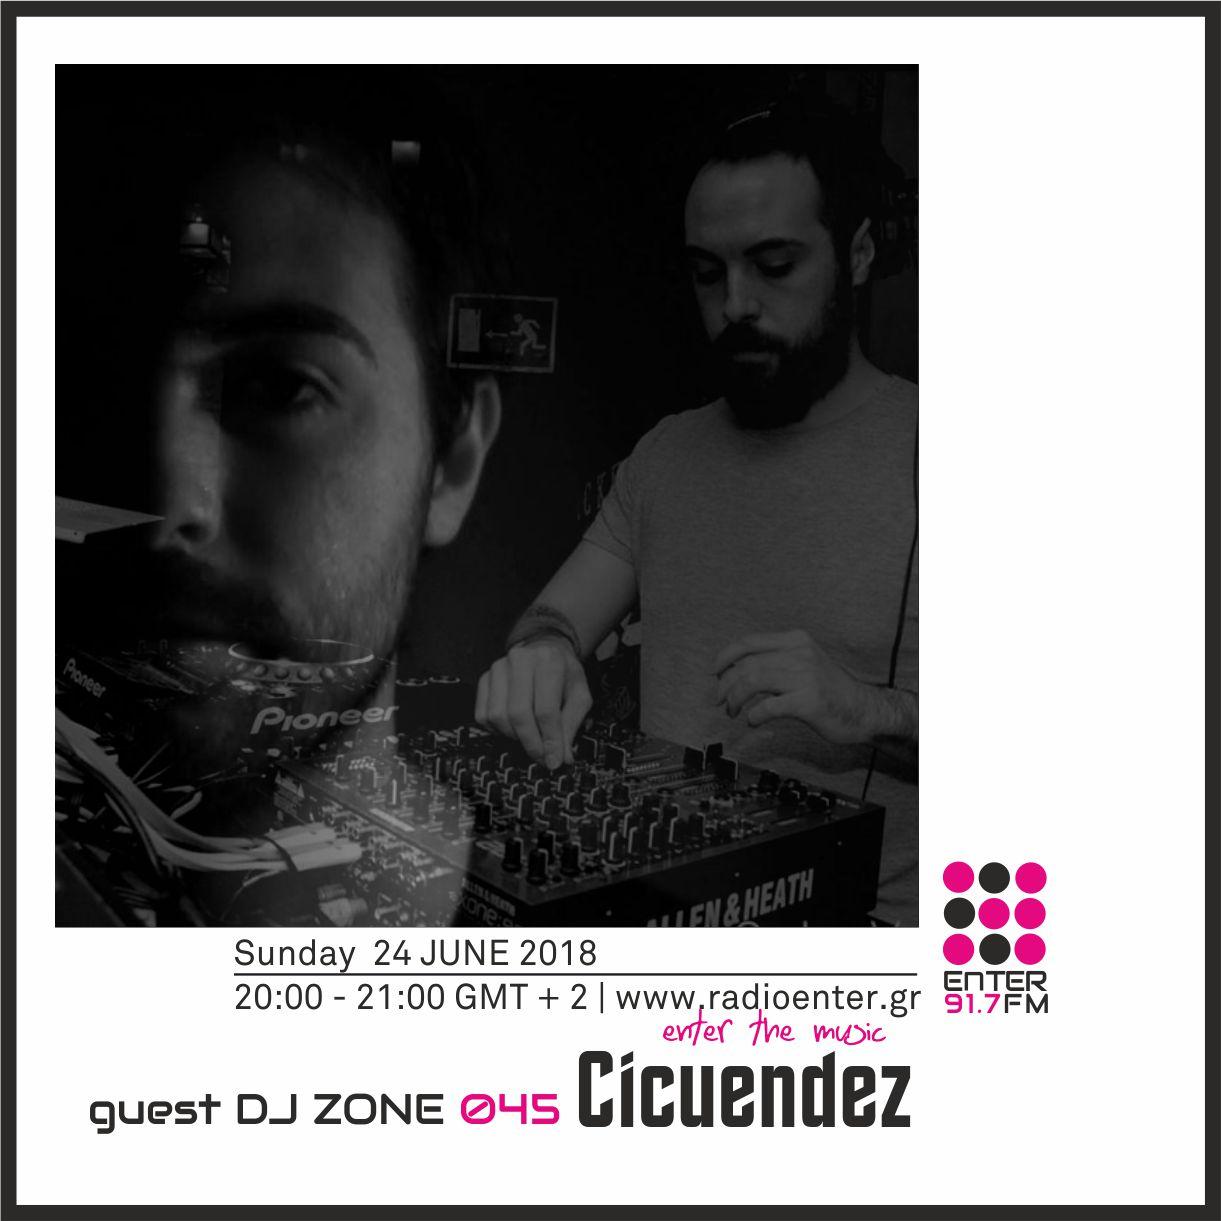 2018.06.24 - Guest dj Zone #045 - Cicuendez